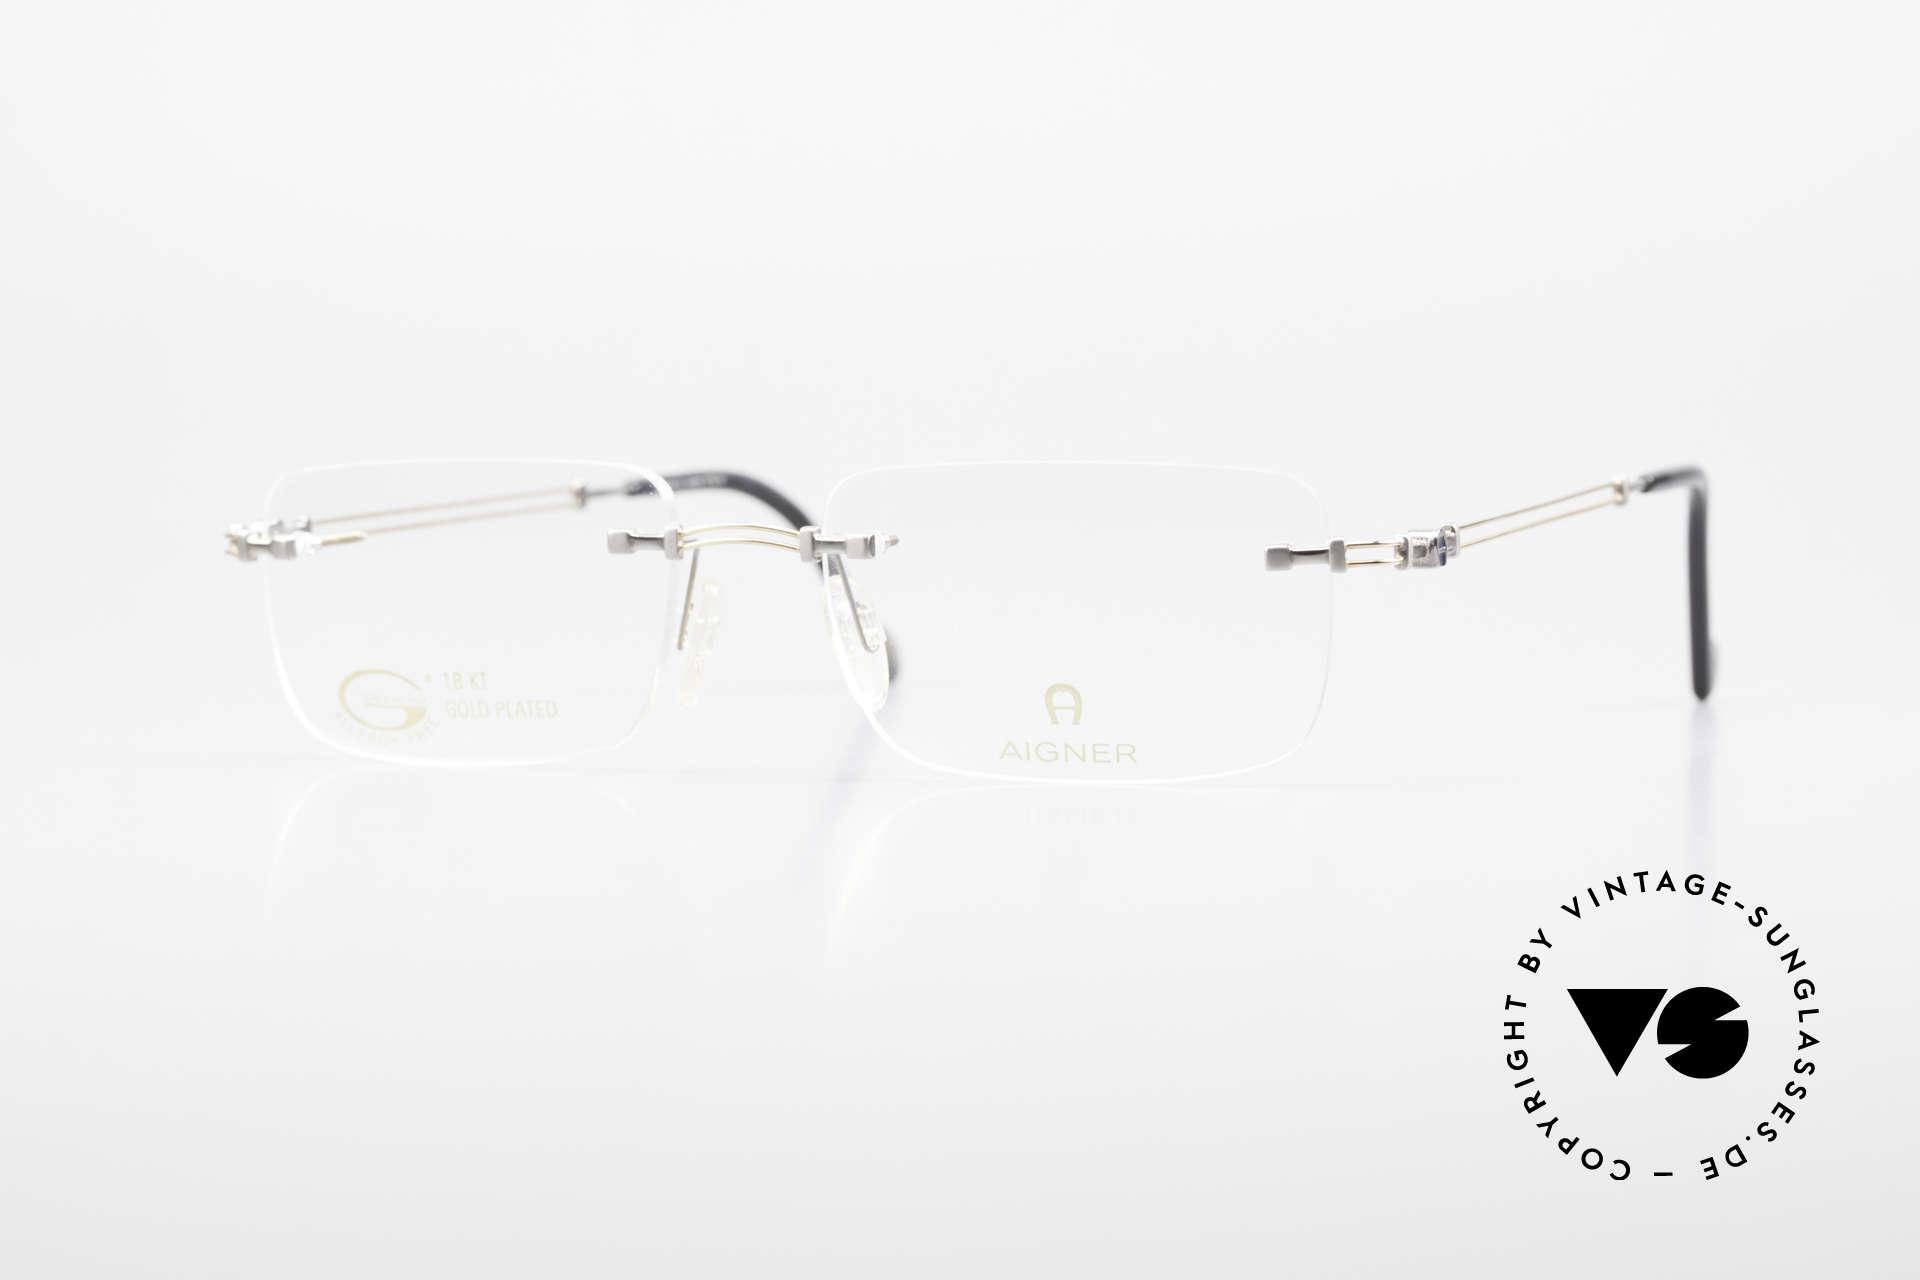 Aigner EA496 Randlose 90er Vintage Brille, randlose Aigner VINTAGE Brille, EA496, Gr. 54/18, 140, Passend für Herren